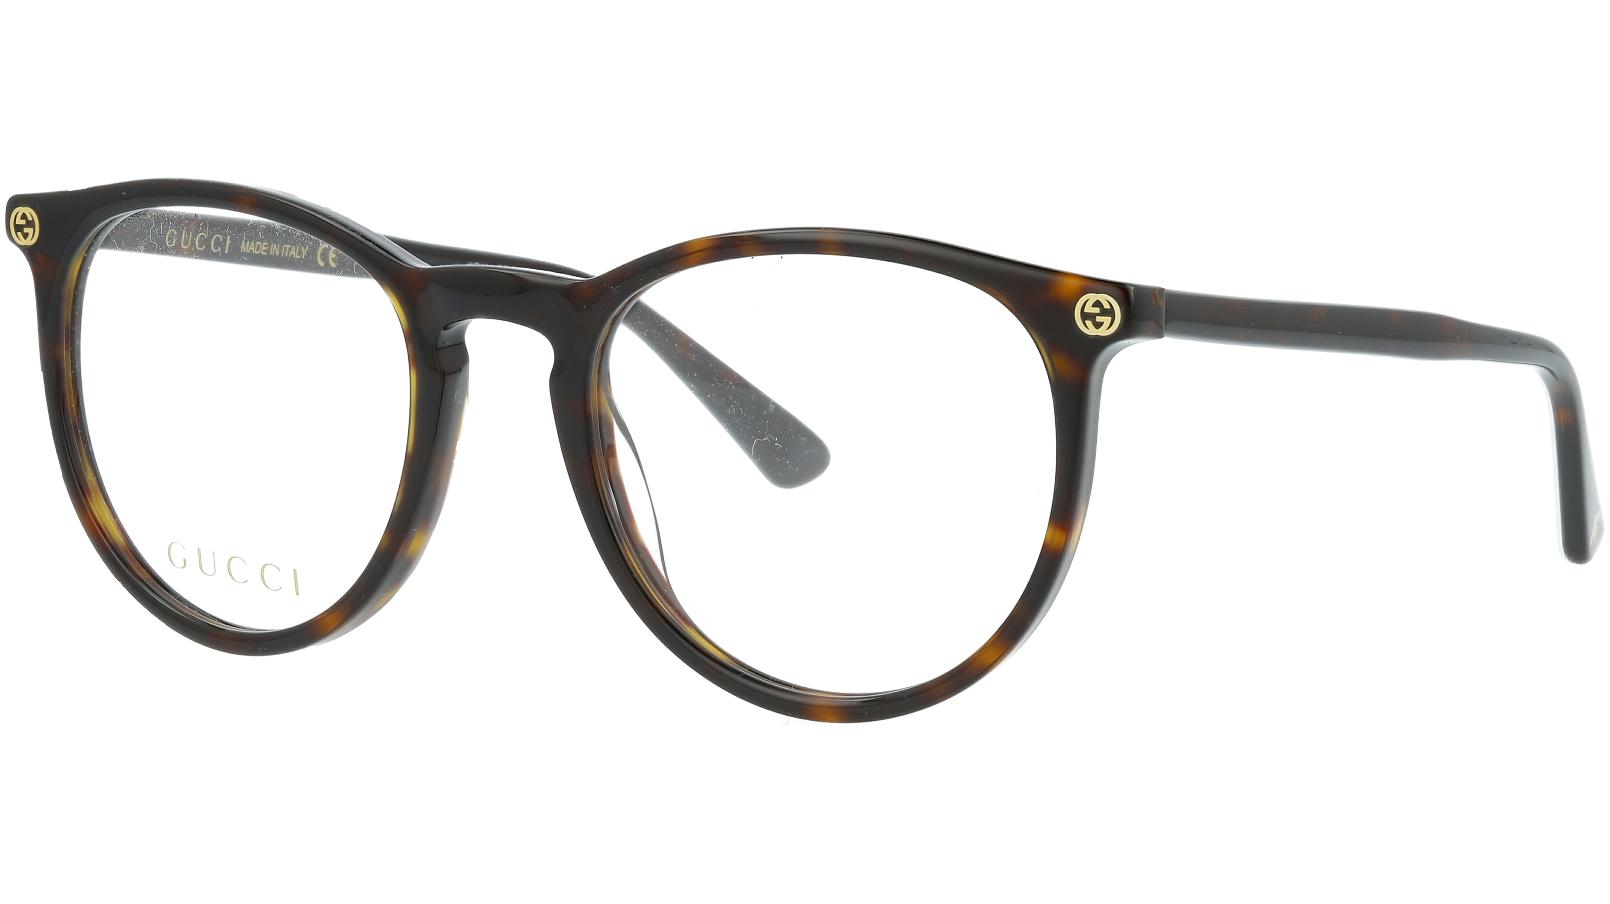 GUCCI GG0027O 002 50 AVANA Glasses